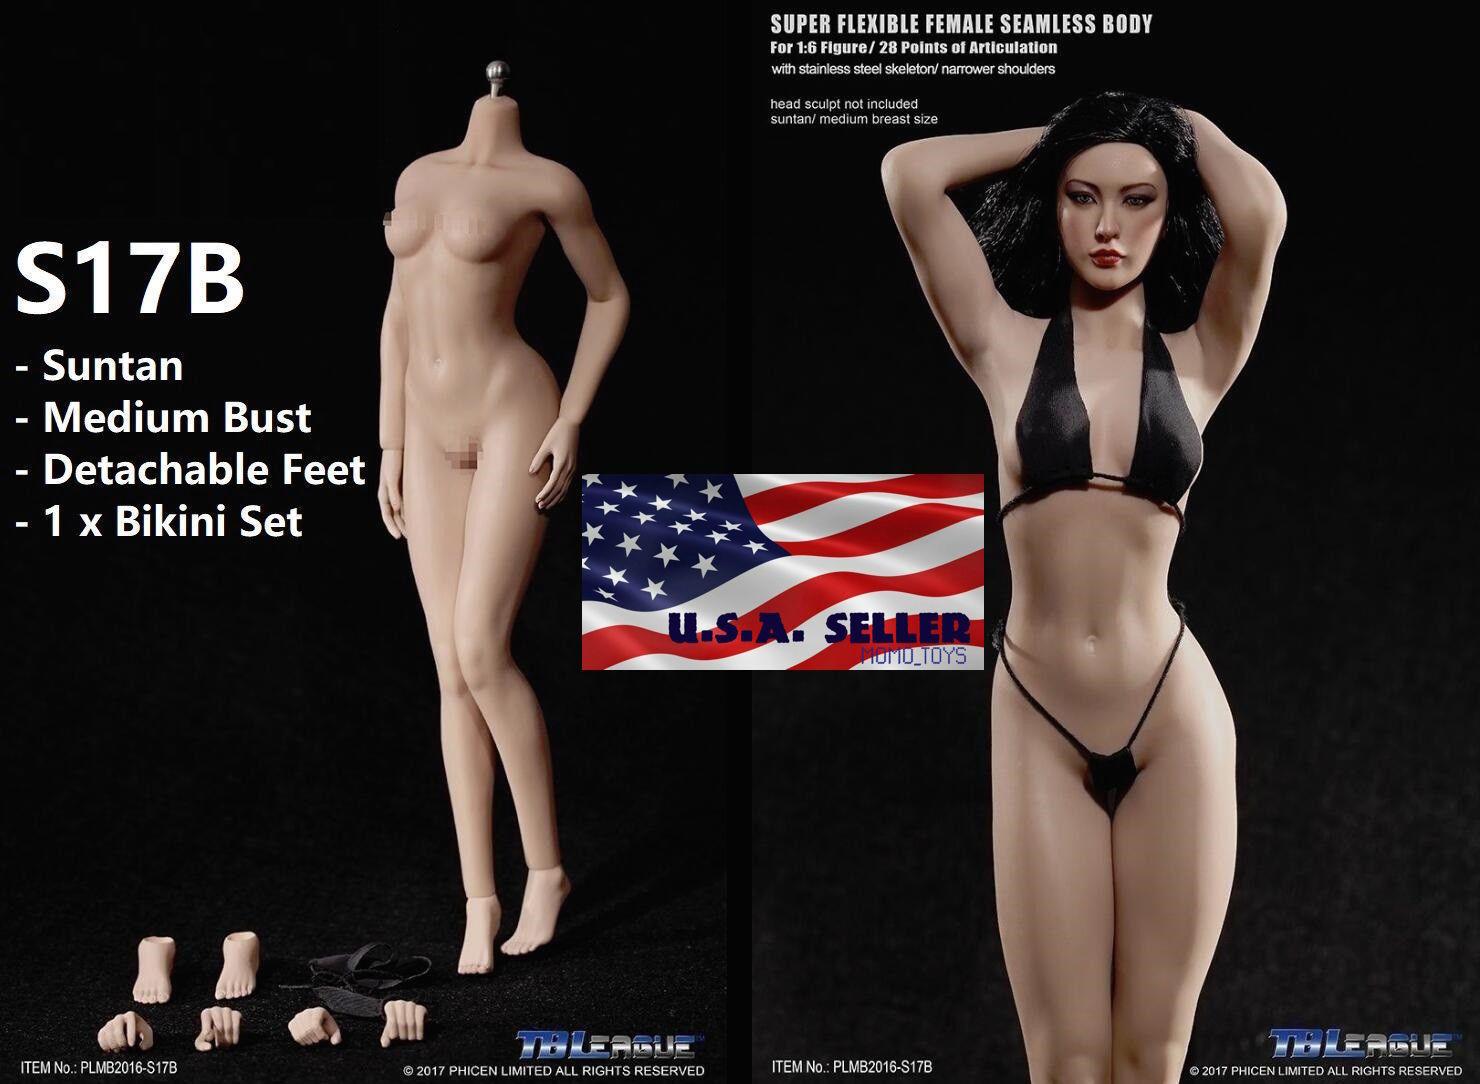 PHICEN 1/6 S17B Seamless Steel Skeleton M Bust Female Body SUNTAN TBLeague USA